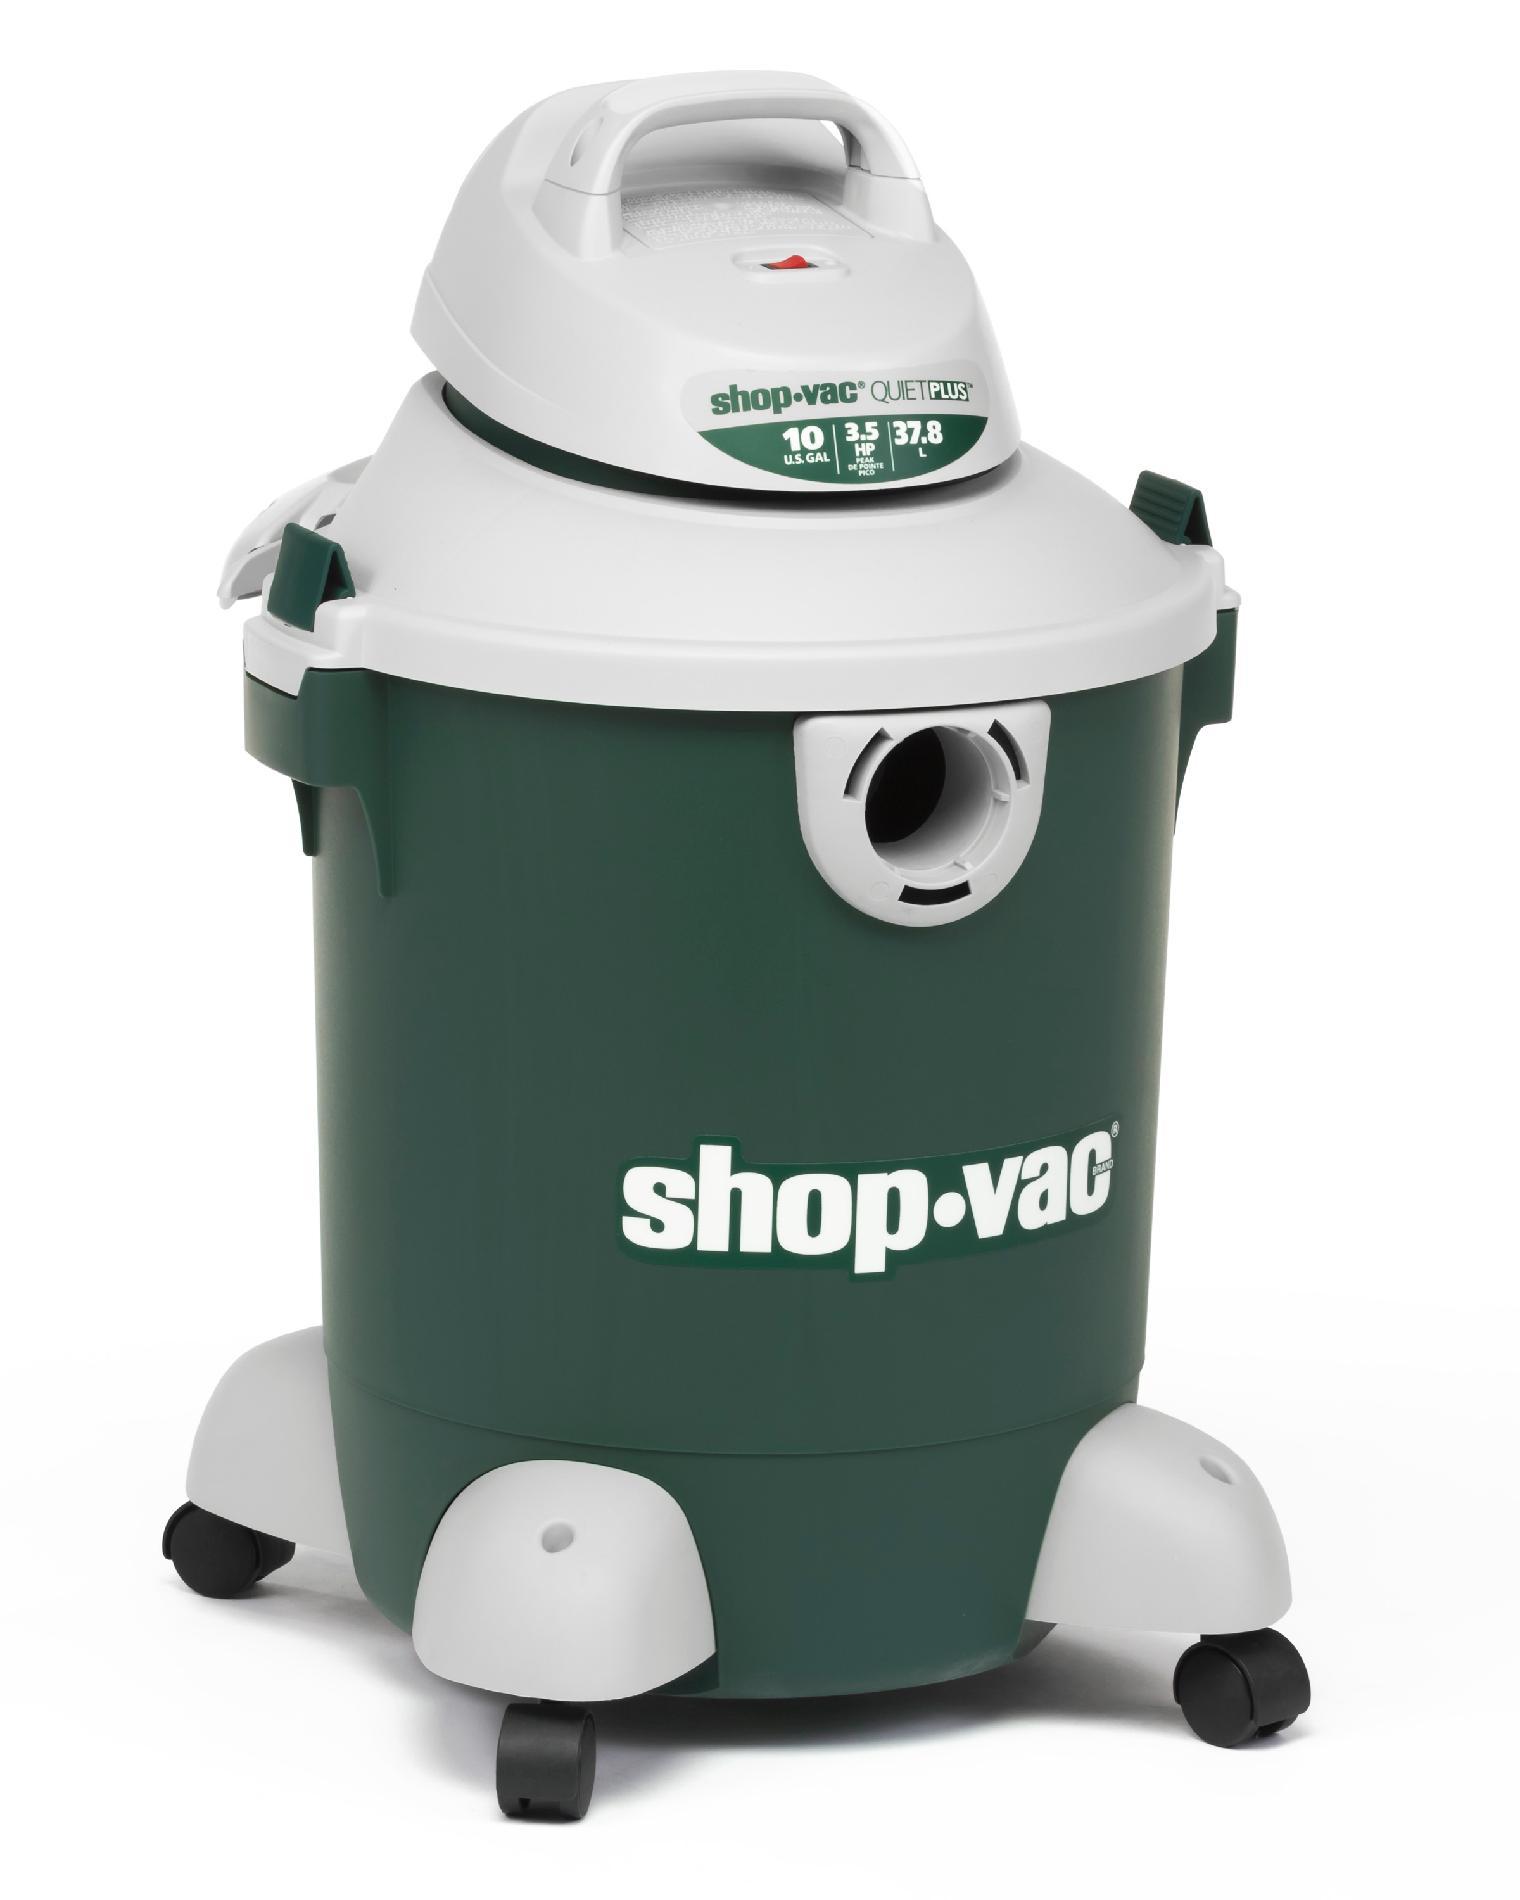 Vac 5981000 10 Gallon 3.5 Peak Hp Quiet Wet Dry Vac